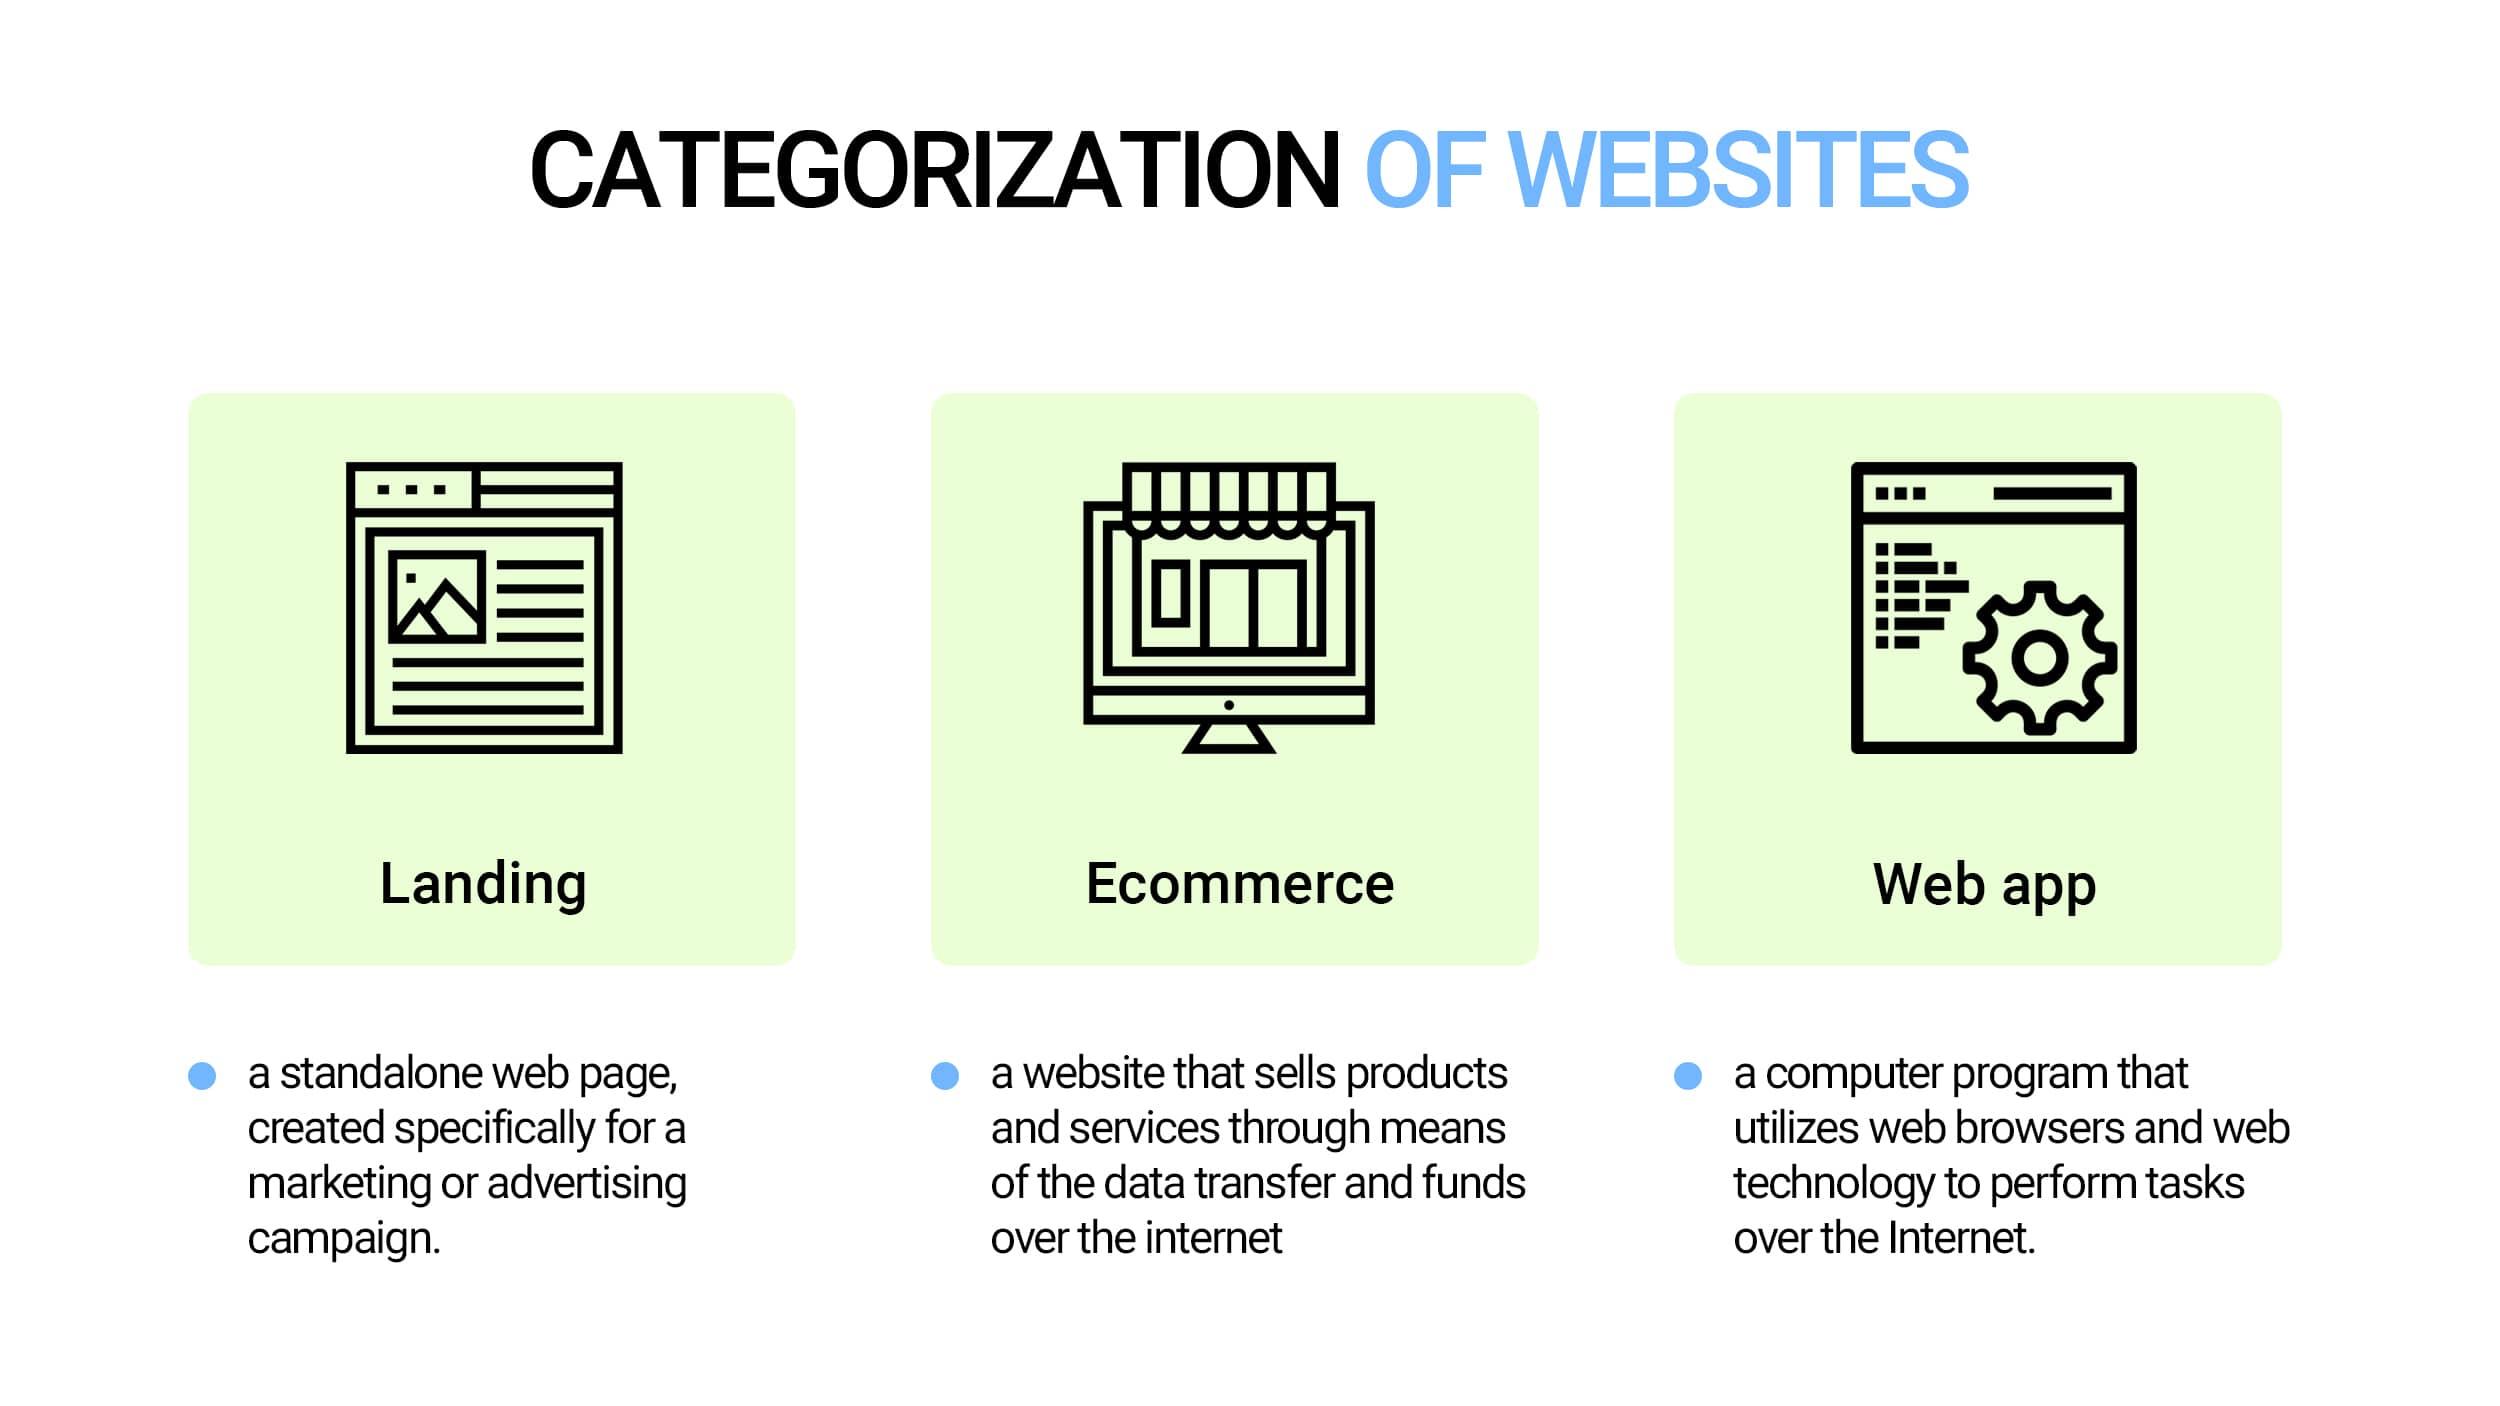 Categorization of websites